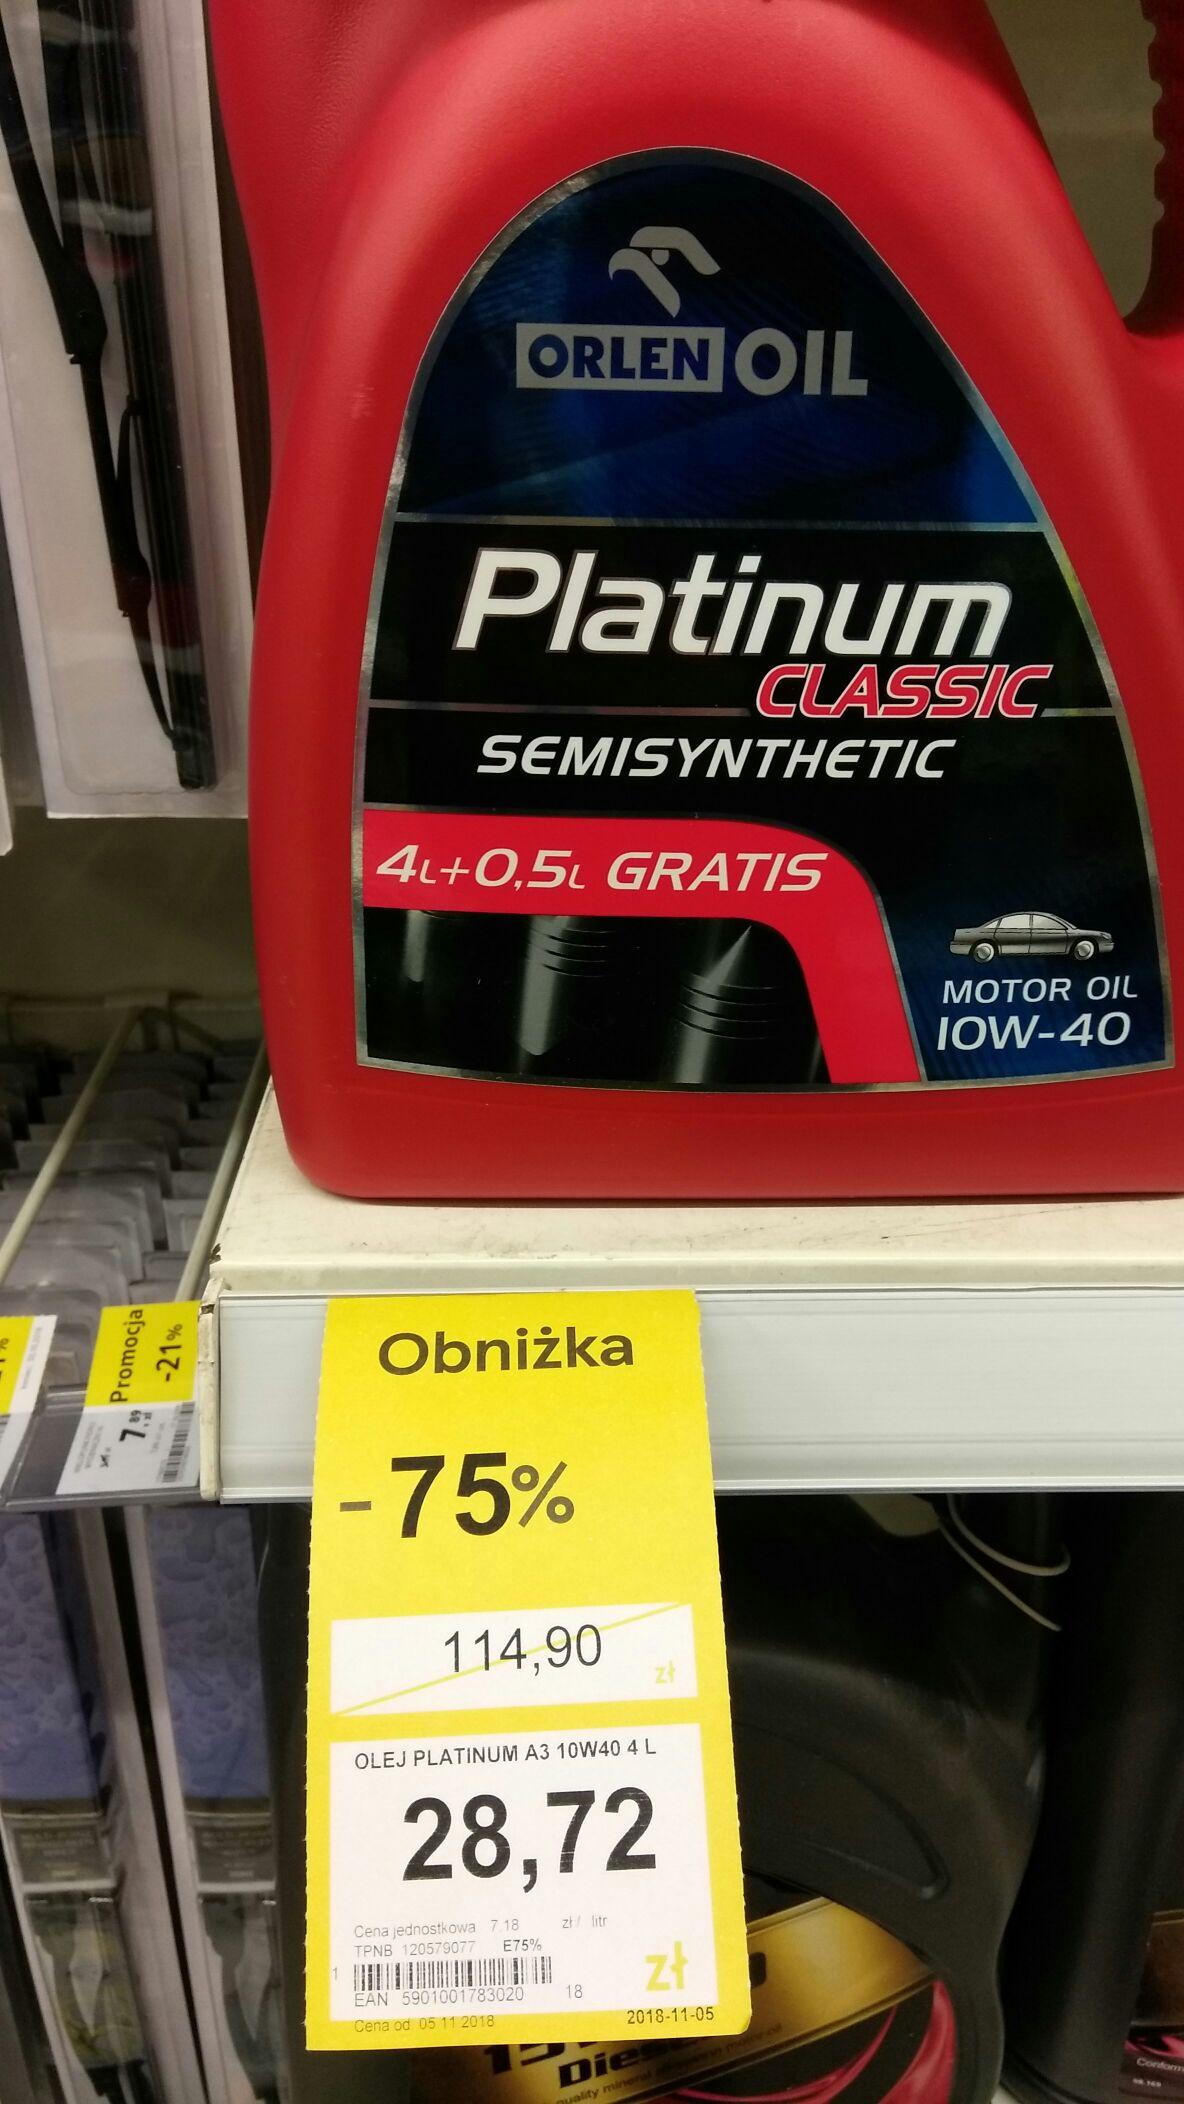 Olej Orlen Platinum Classic 10w40 4.5L semisynthetic